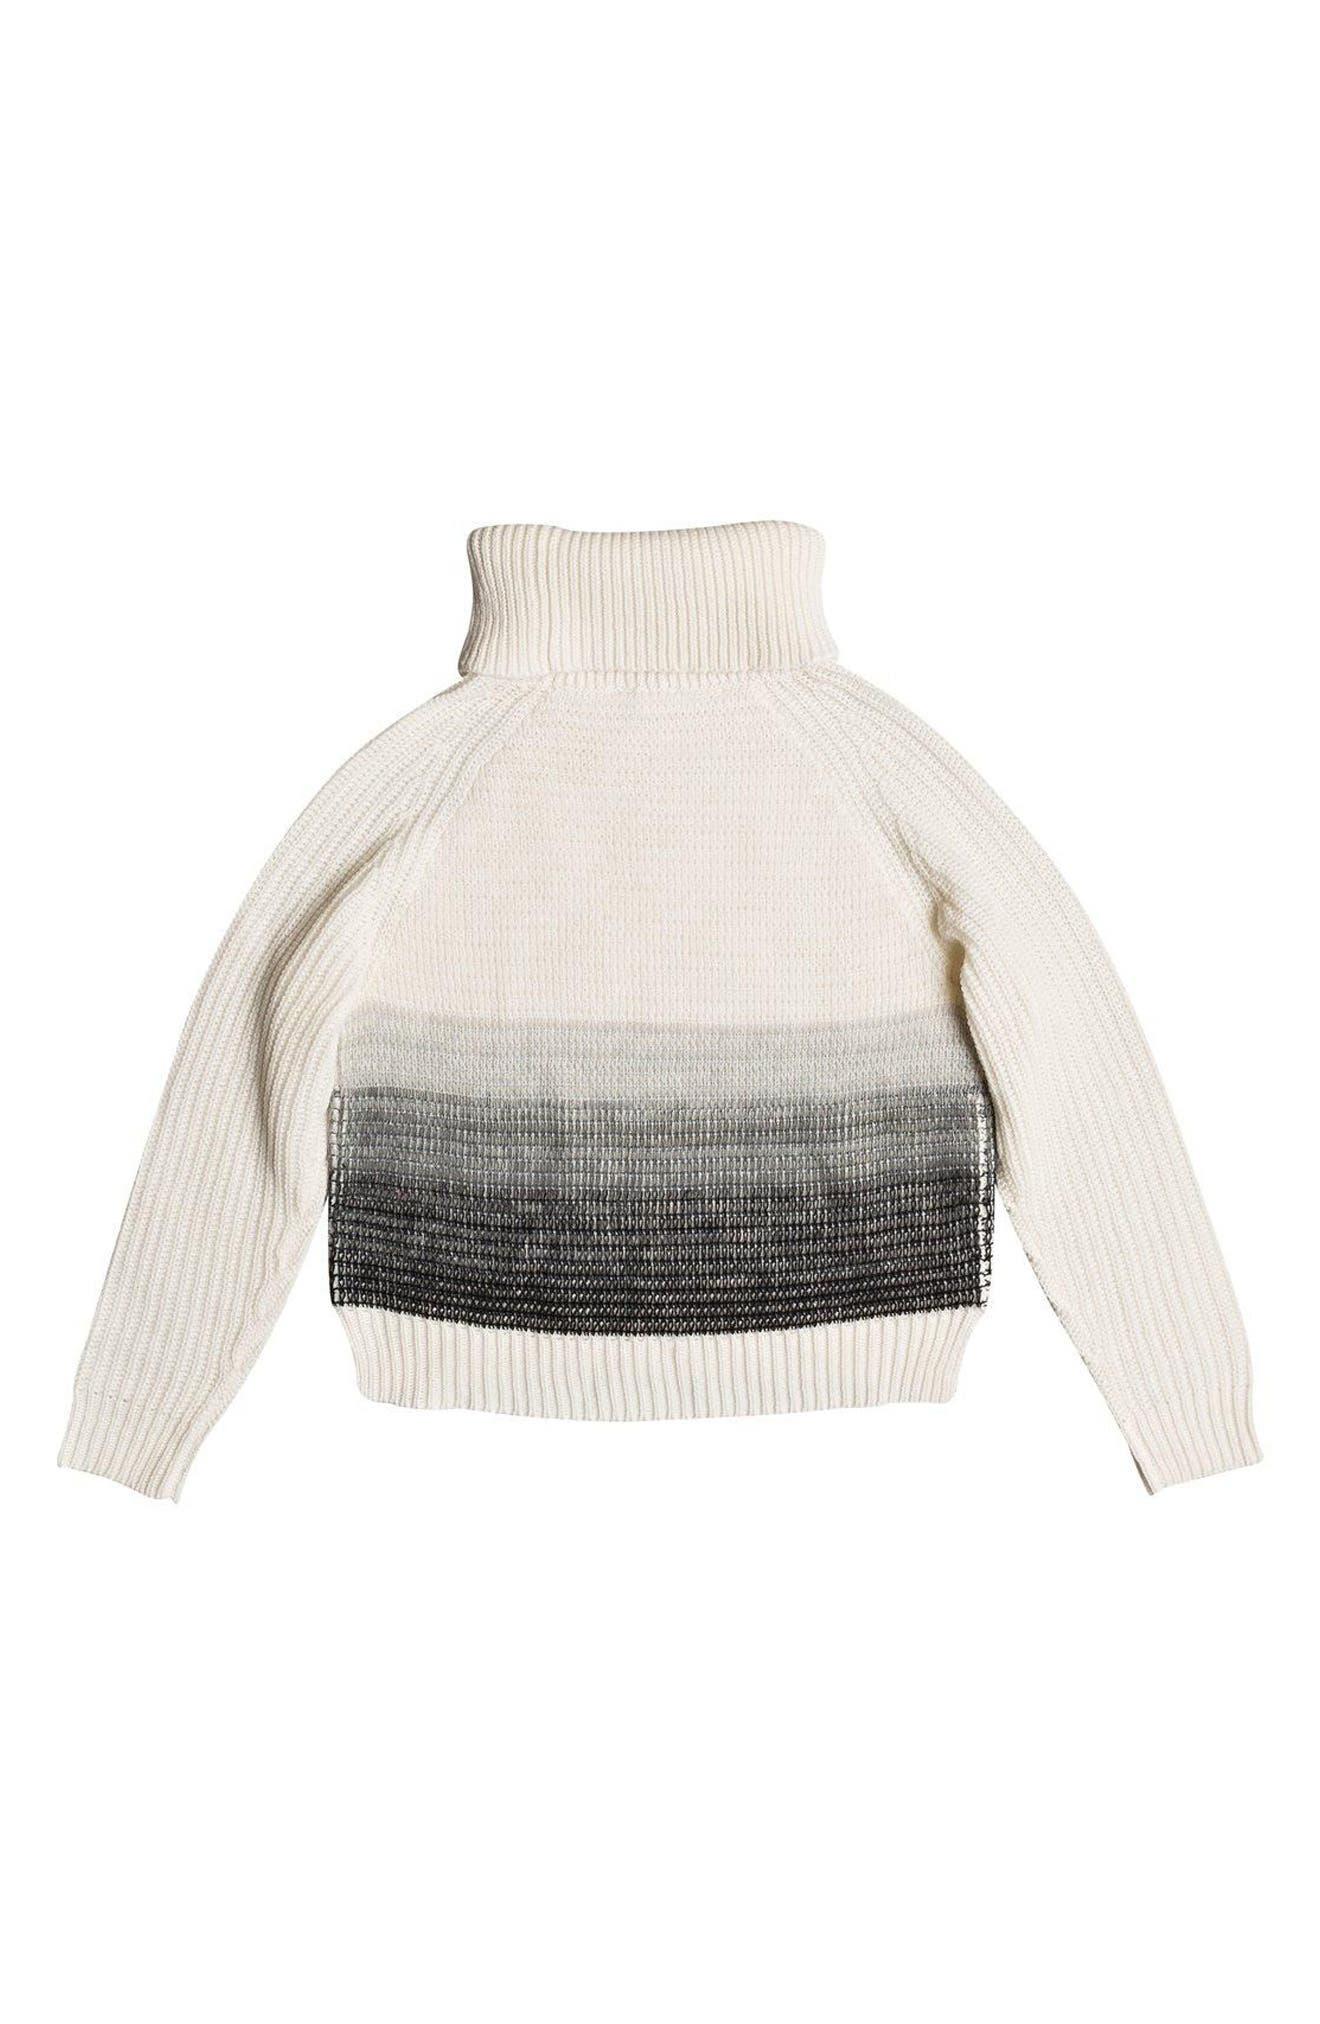 Morning Sun Sweater,                             Alternate thumbnail 3, color,                             101